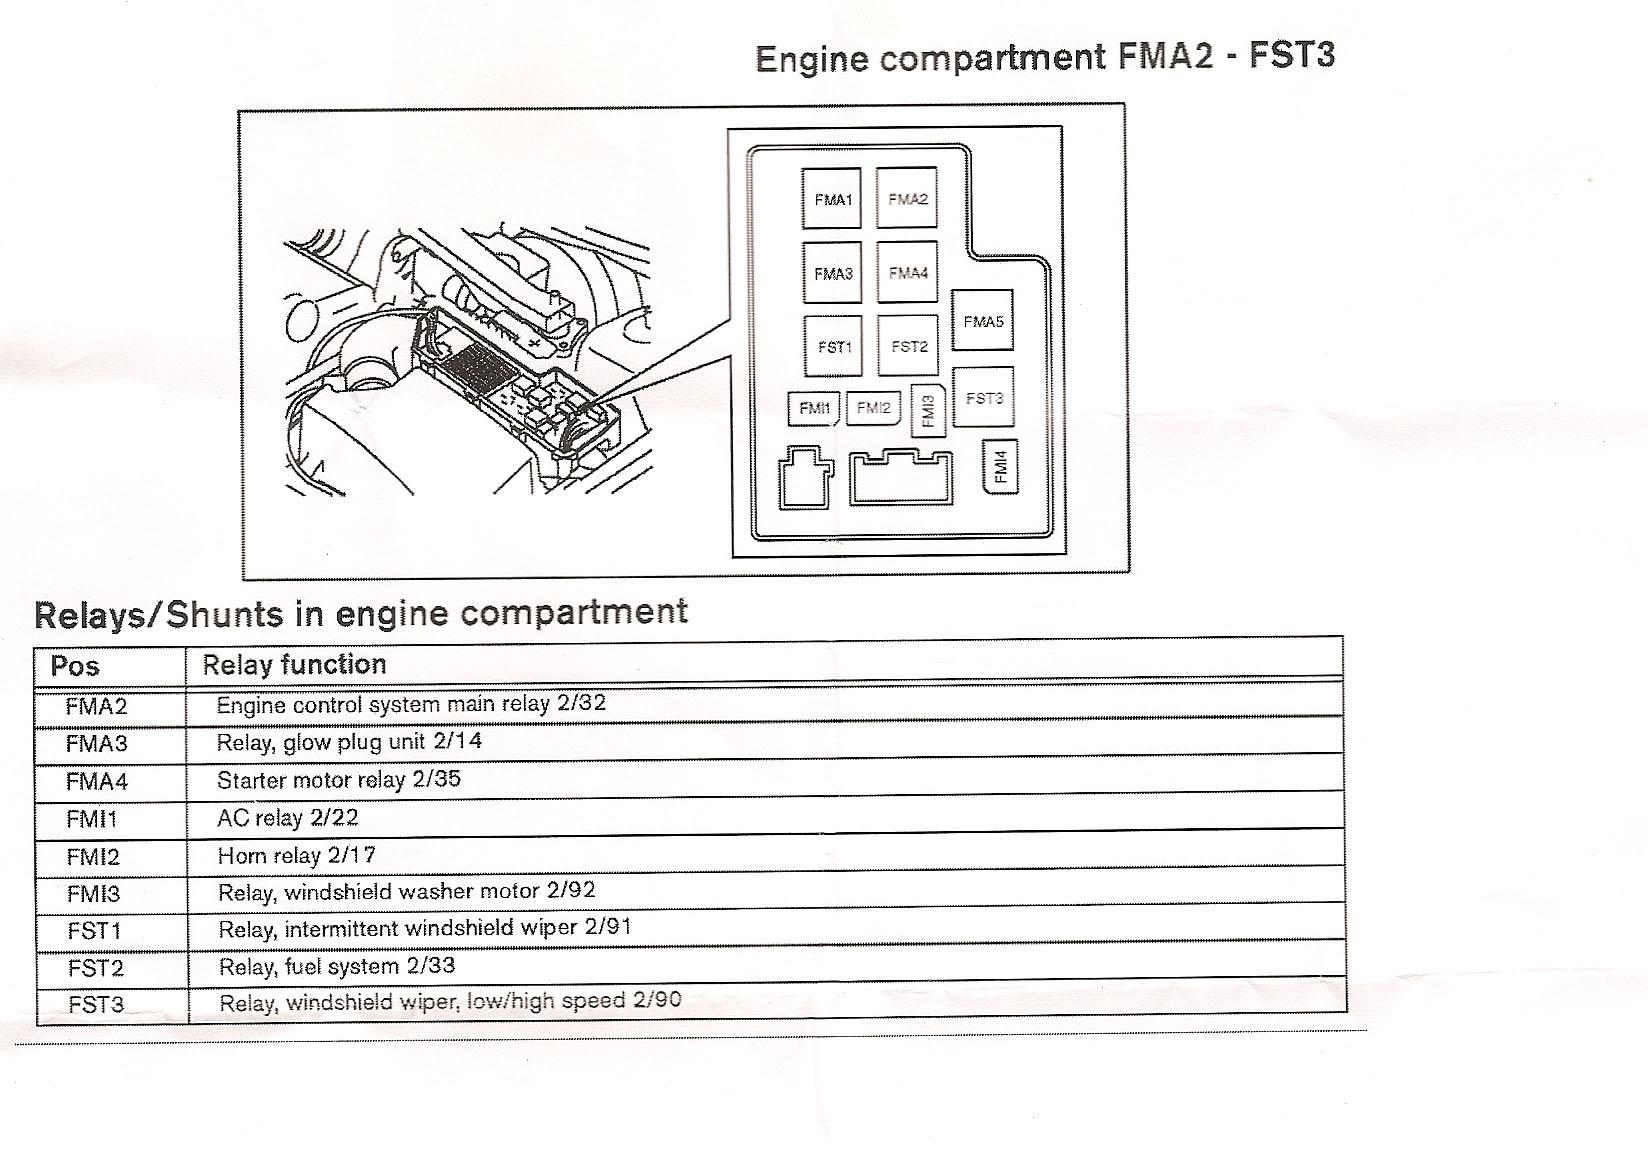 volvo s60 trunk fuse box diagram wiring schematic diagram Fuse Box Diagram For S60